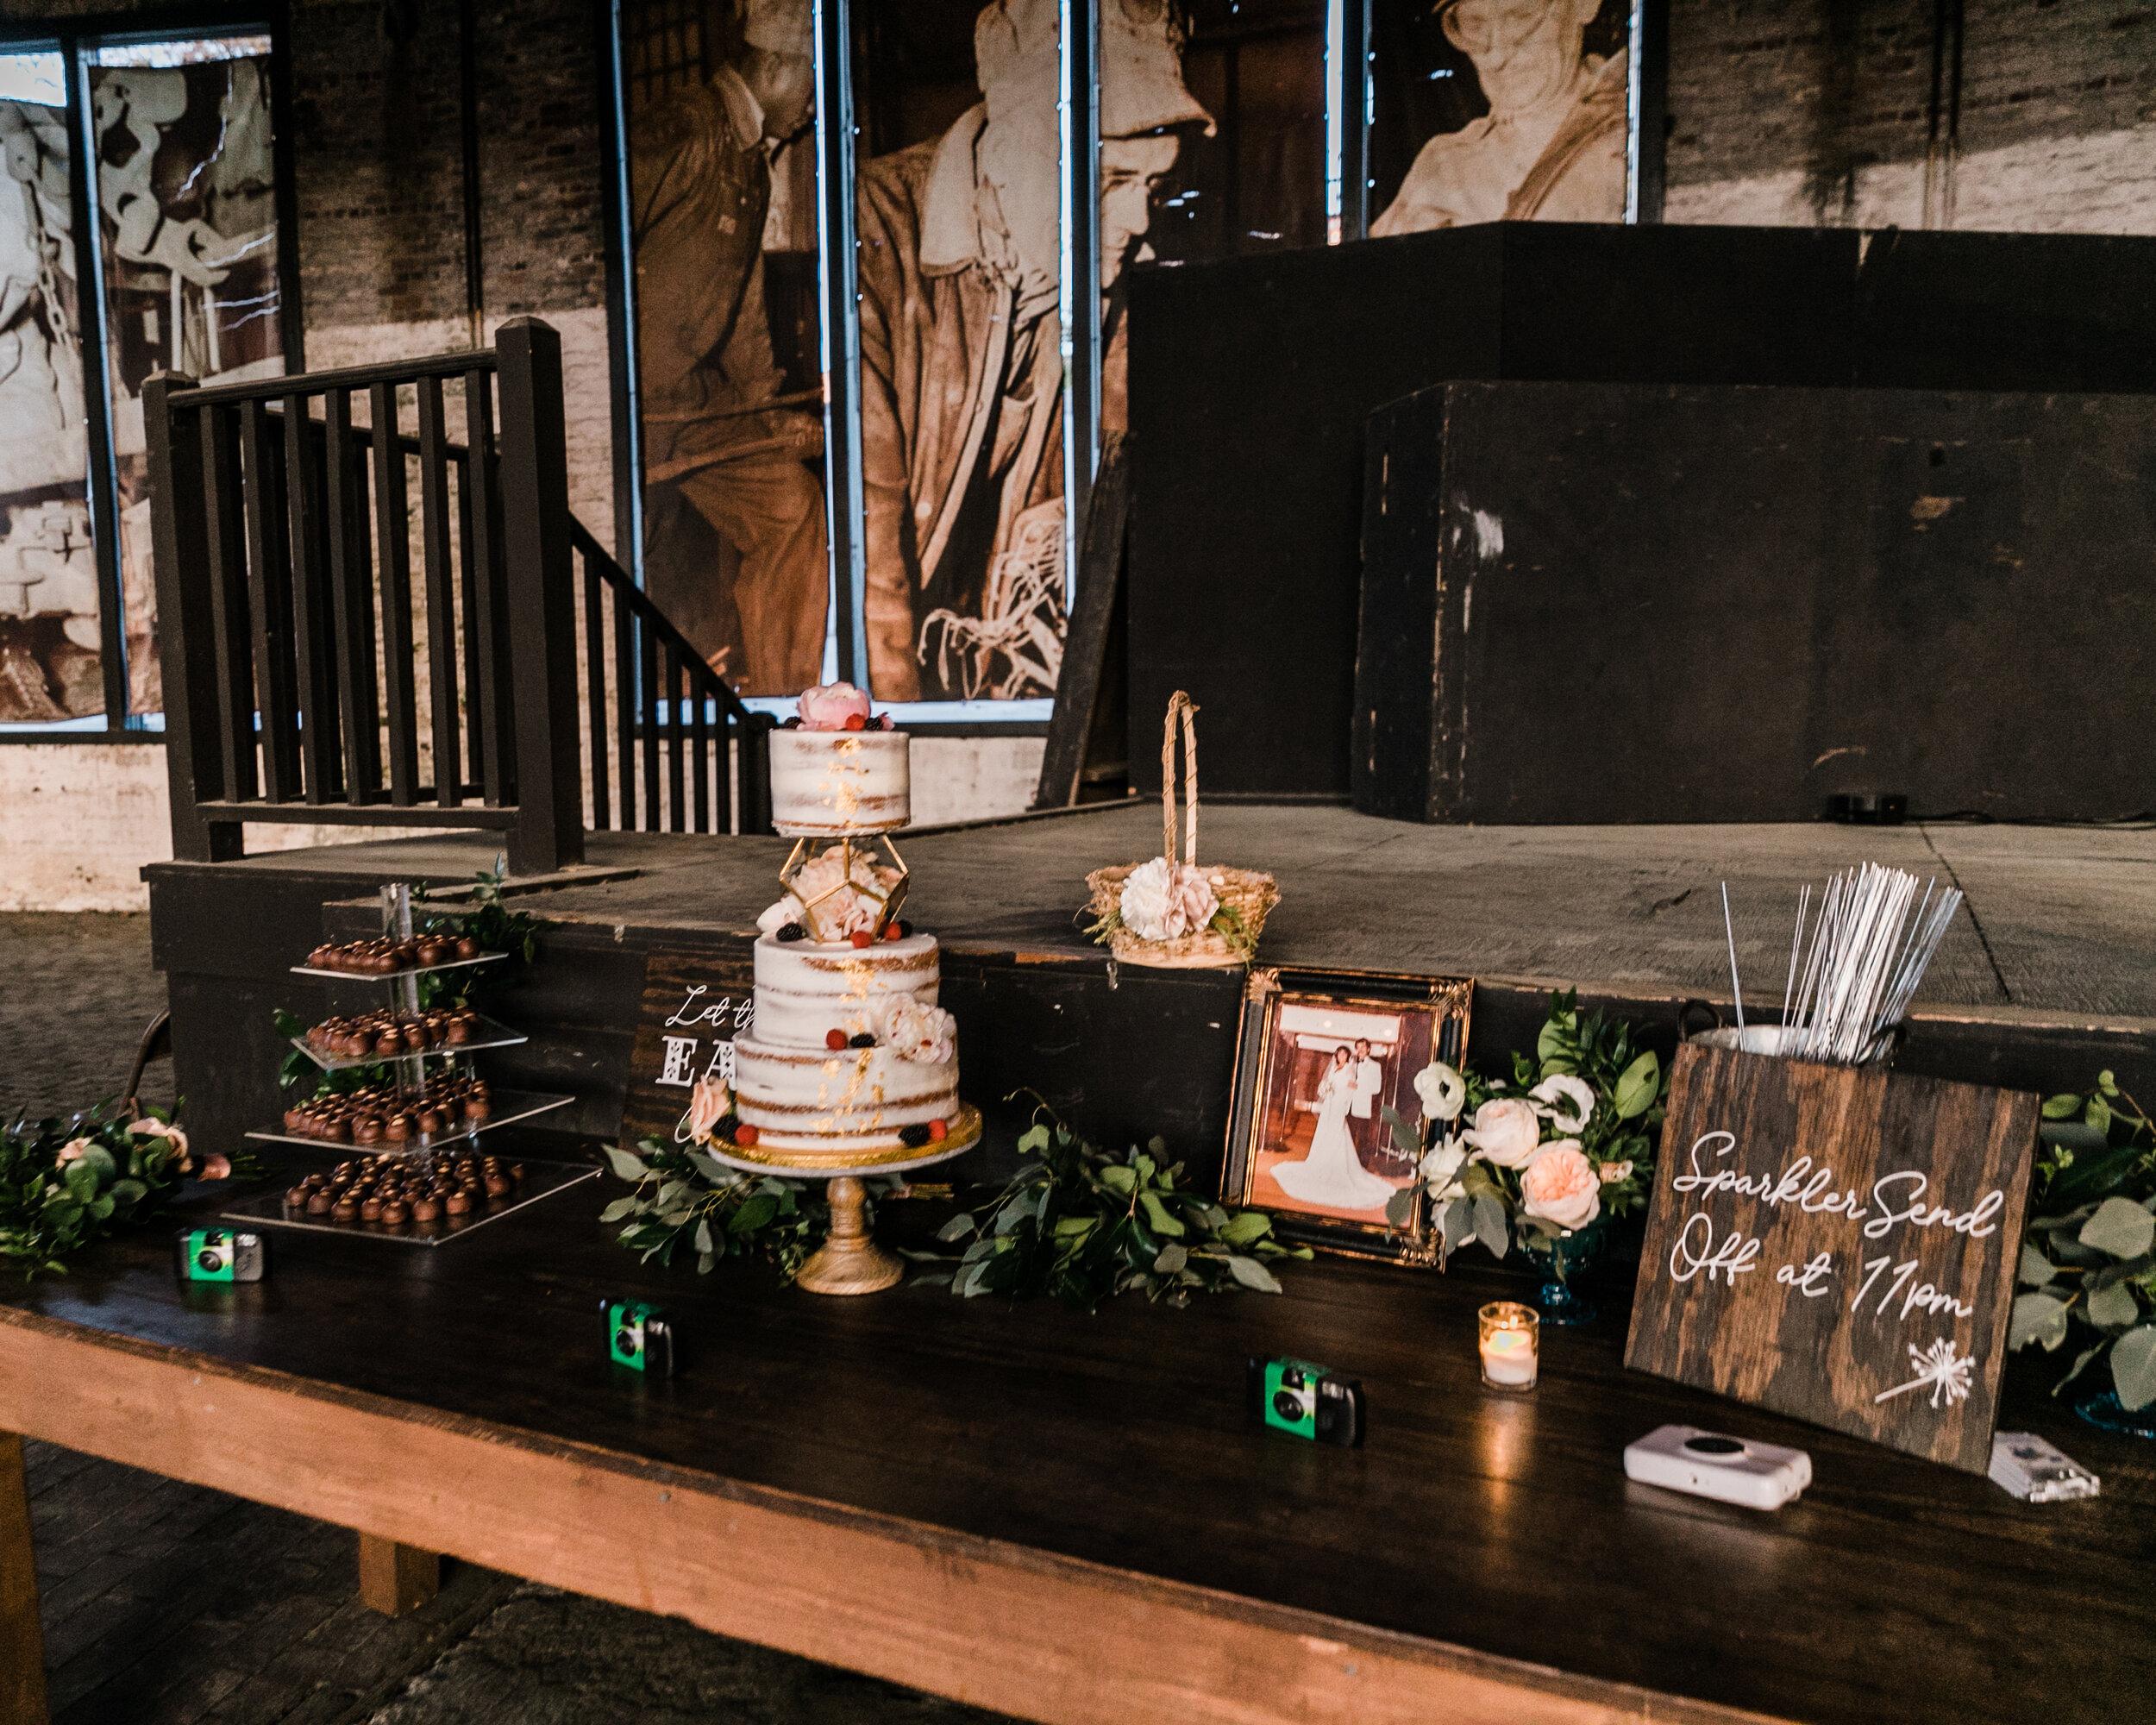 ivory-and-beau-blog-weddings-ivory-and-beau-couple-dominique-and-andres-savannah-florist-wedding-planning-savannah-bridal-boutique-wedding-flowers-KIP_WEBERWEDDING_RAILROADMUSEUM-1400.JPG